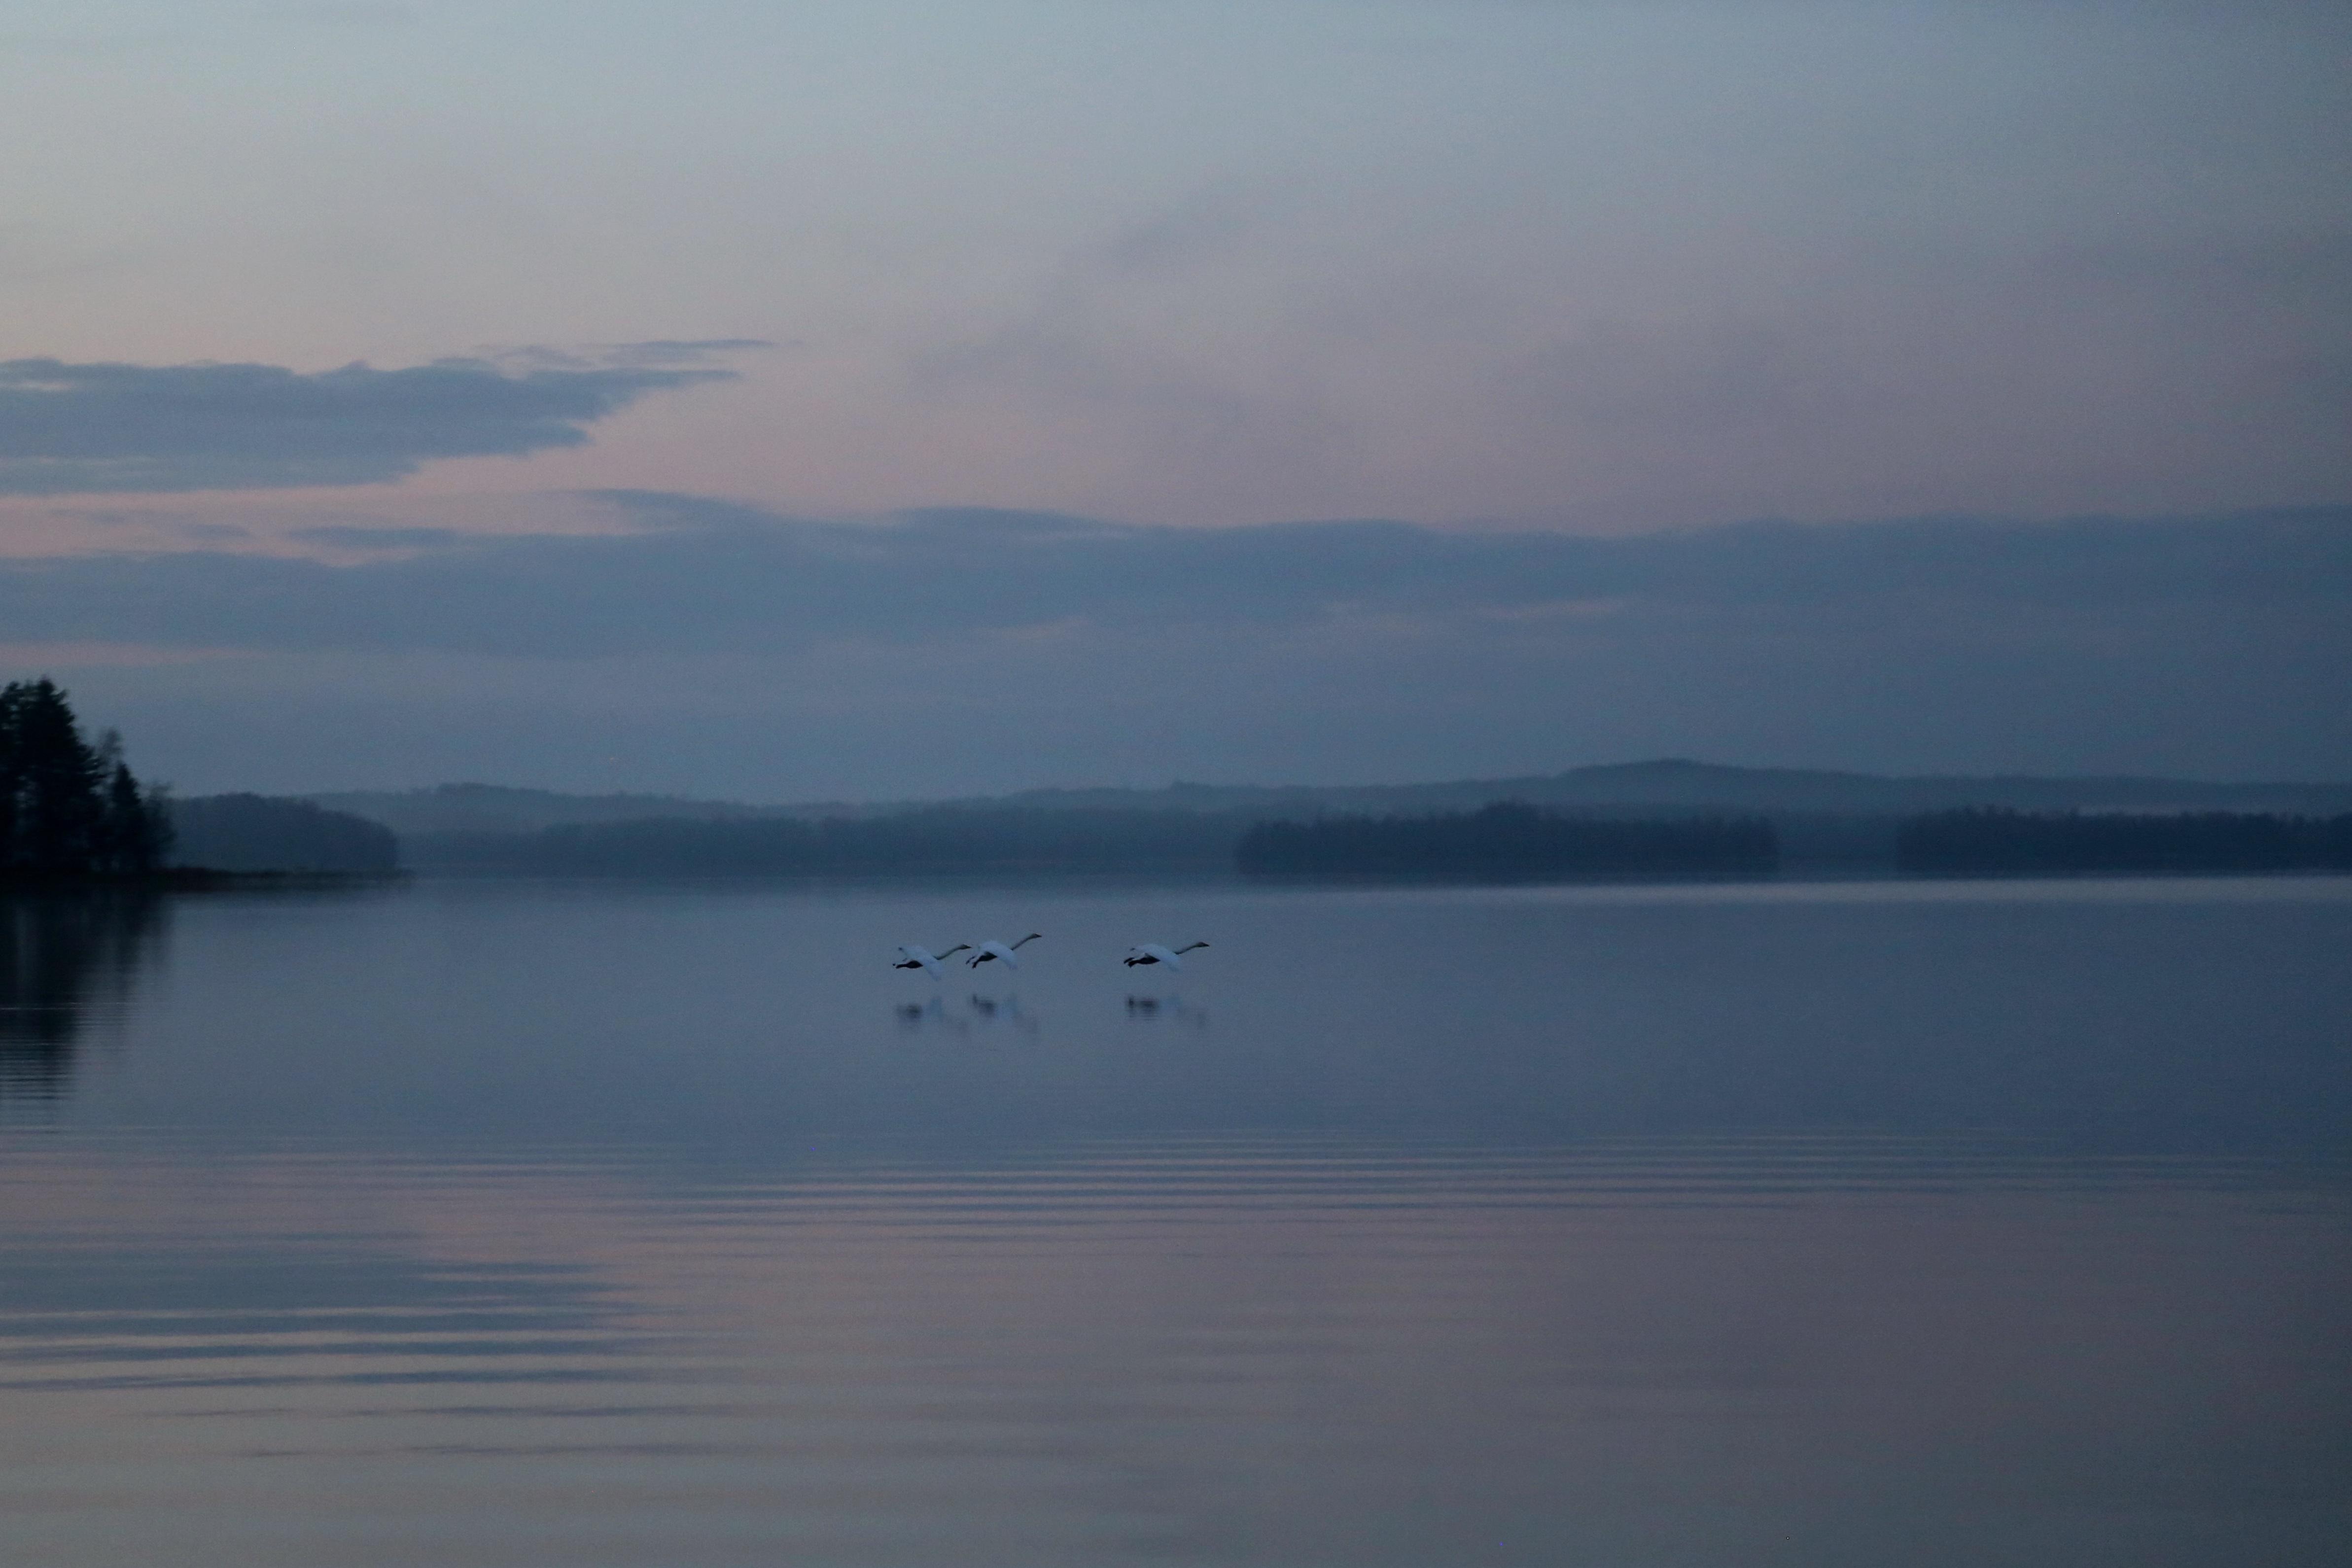 Free Images : sea, coast, nature, ocean, horizon, mountain, cloud